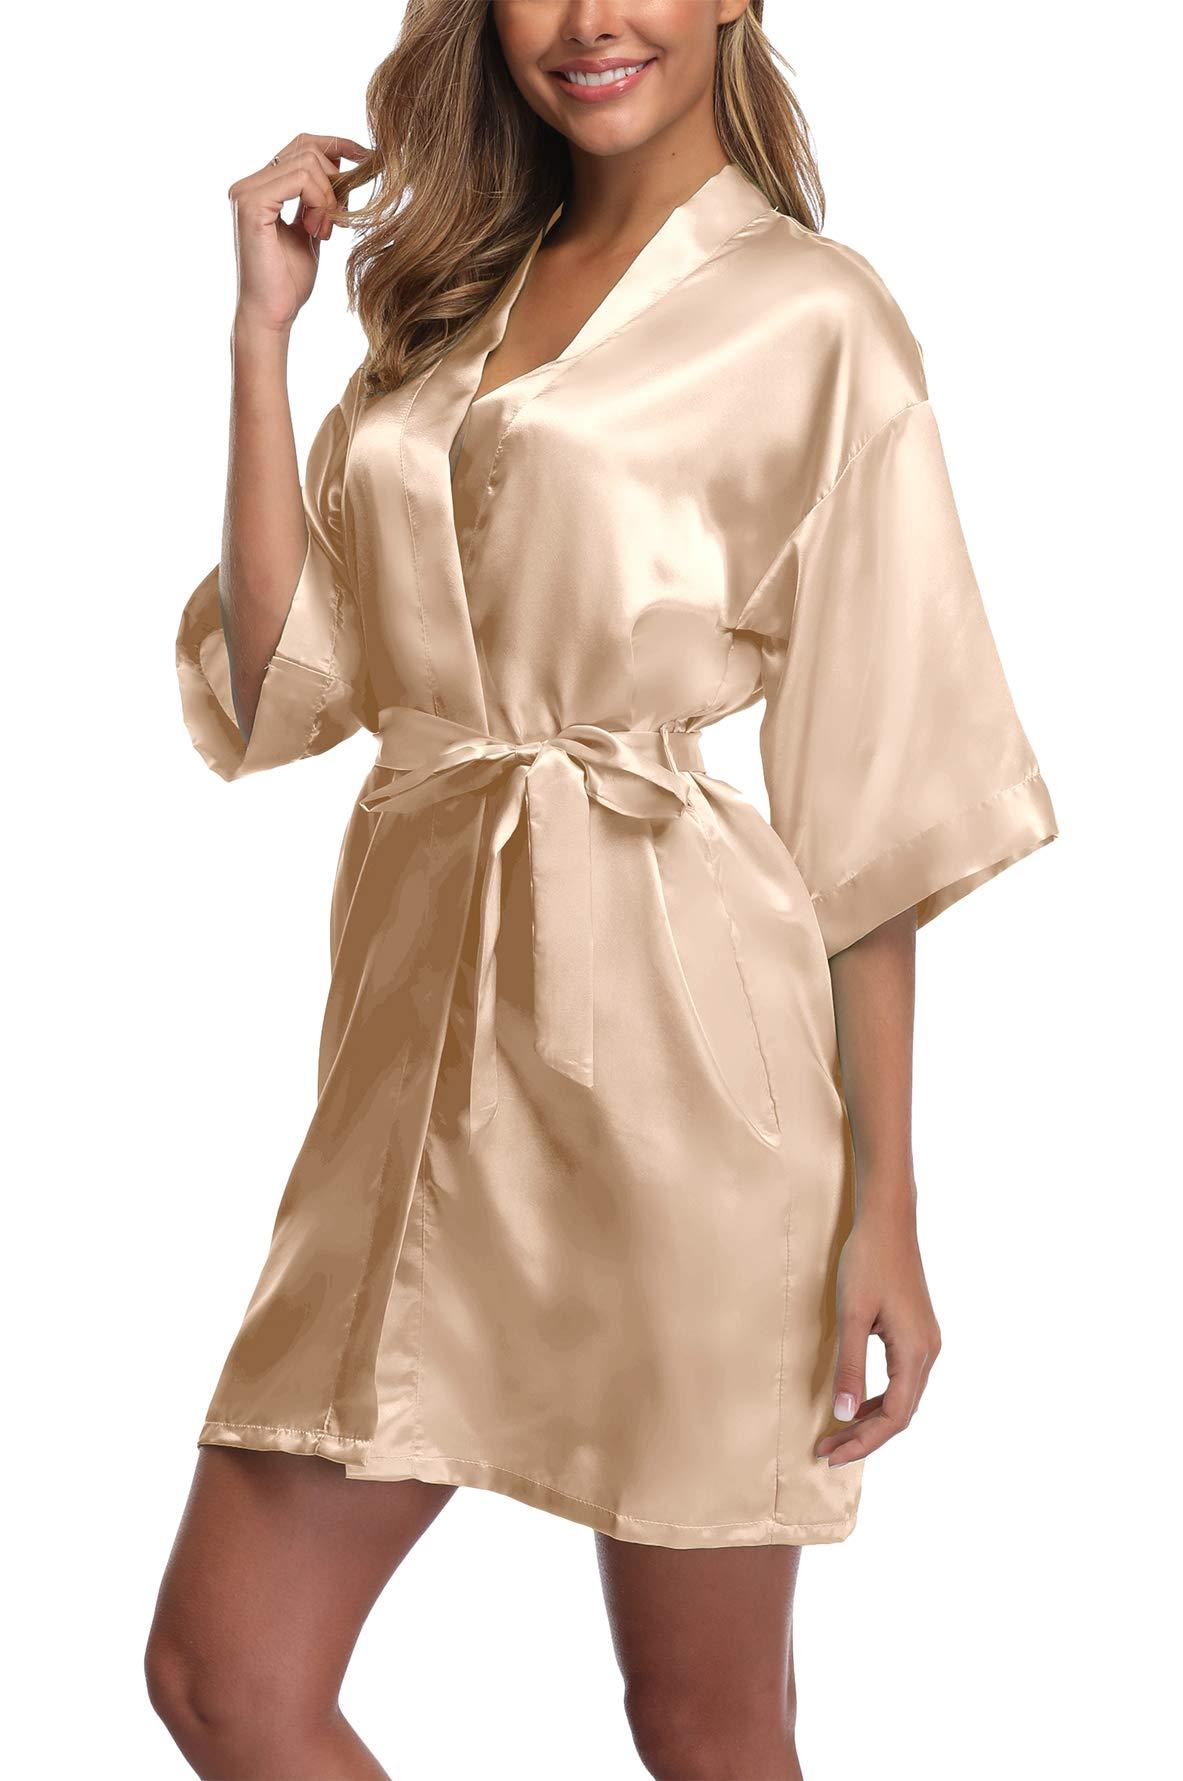 UrHot Women's Short Kimono Robe Bridal Party Robe for Bridesmaid Satin Sleepwear